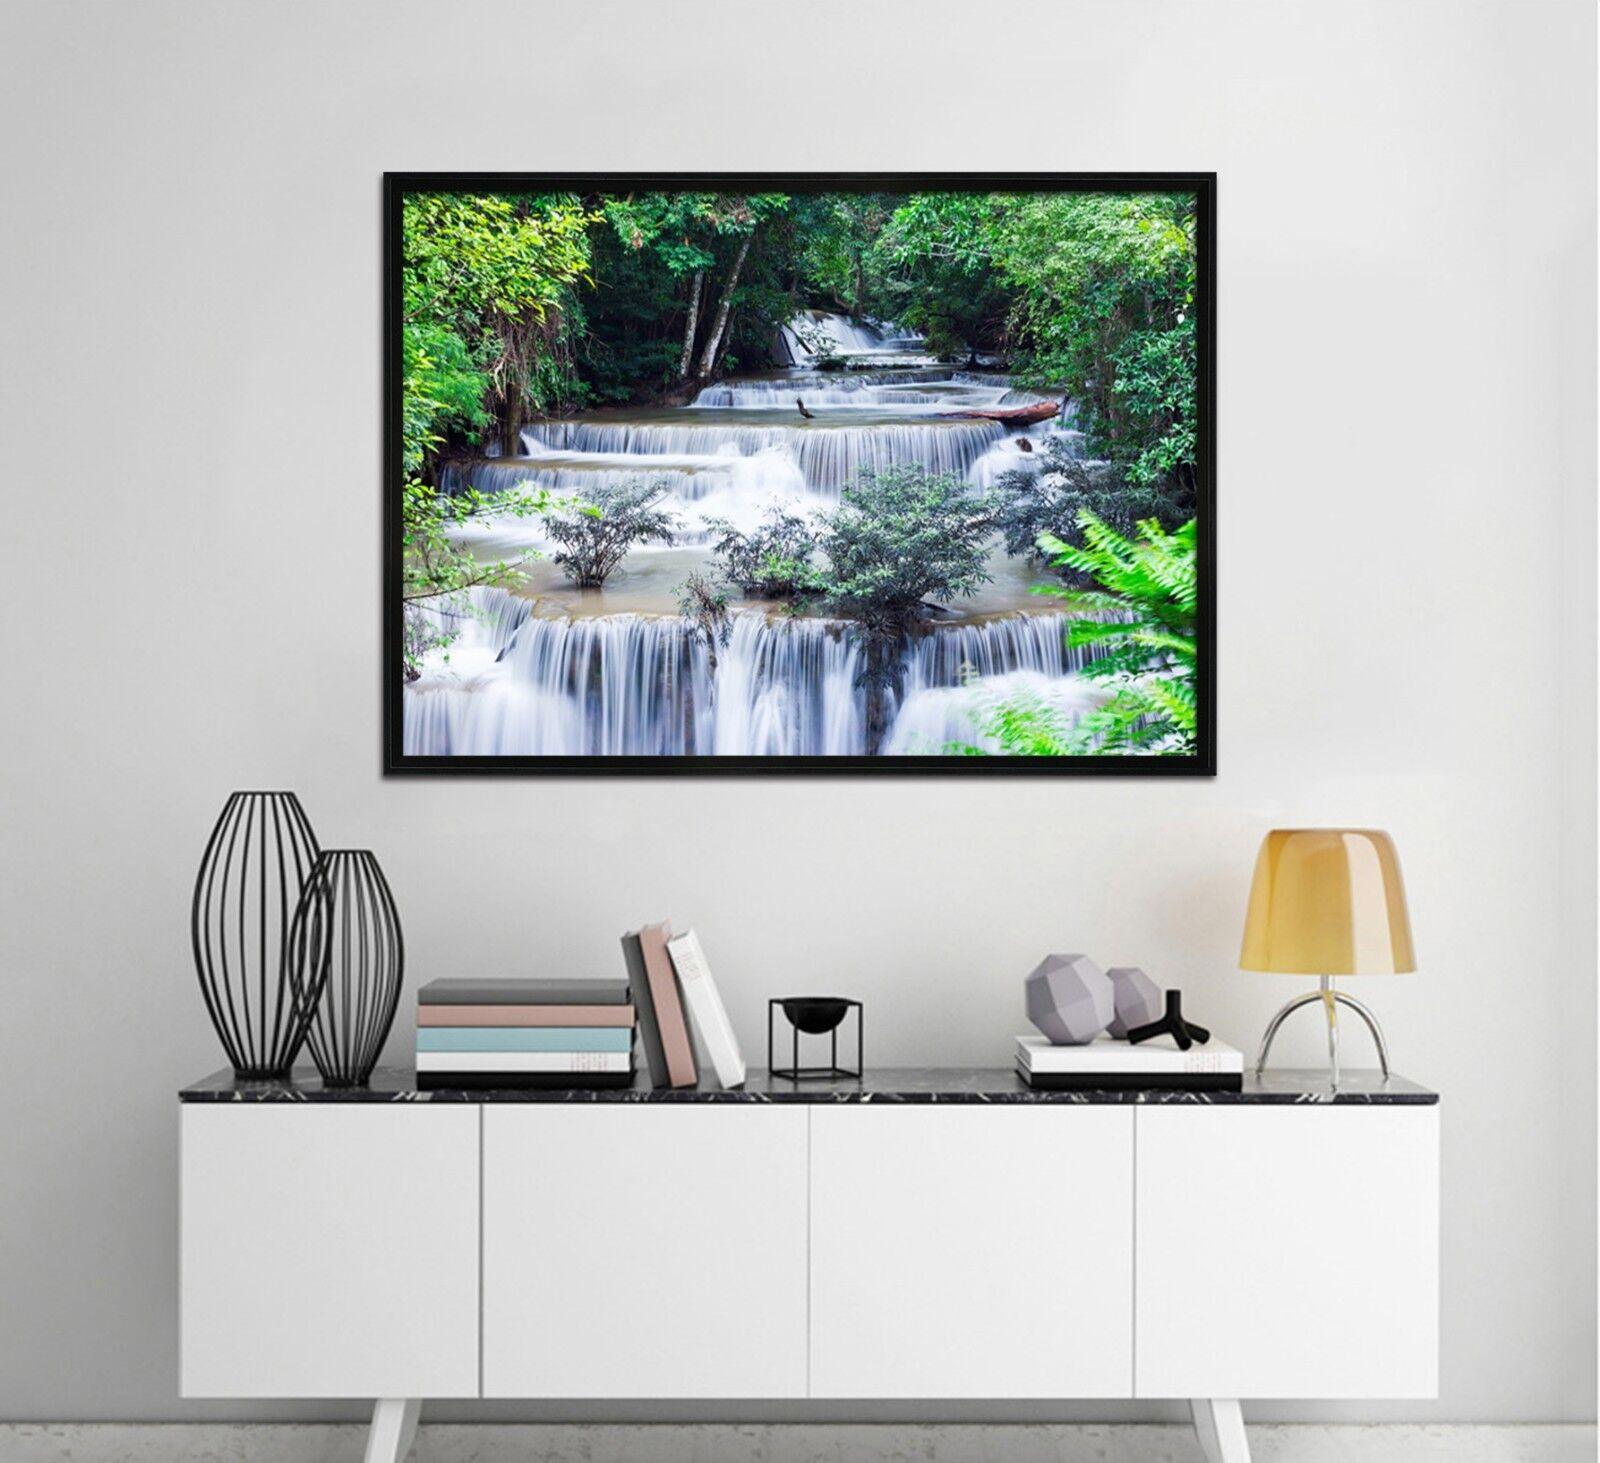 3d Bushes blanc Power 3 Framed Poster Home Decor Prints Painting Art AJ DE